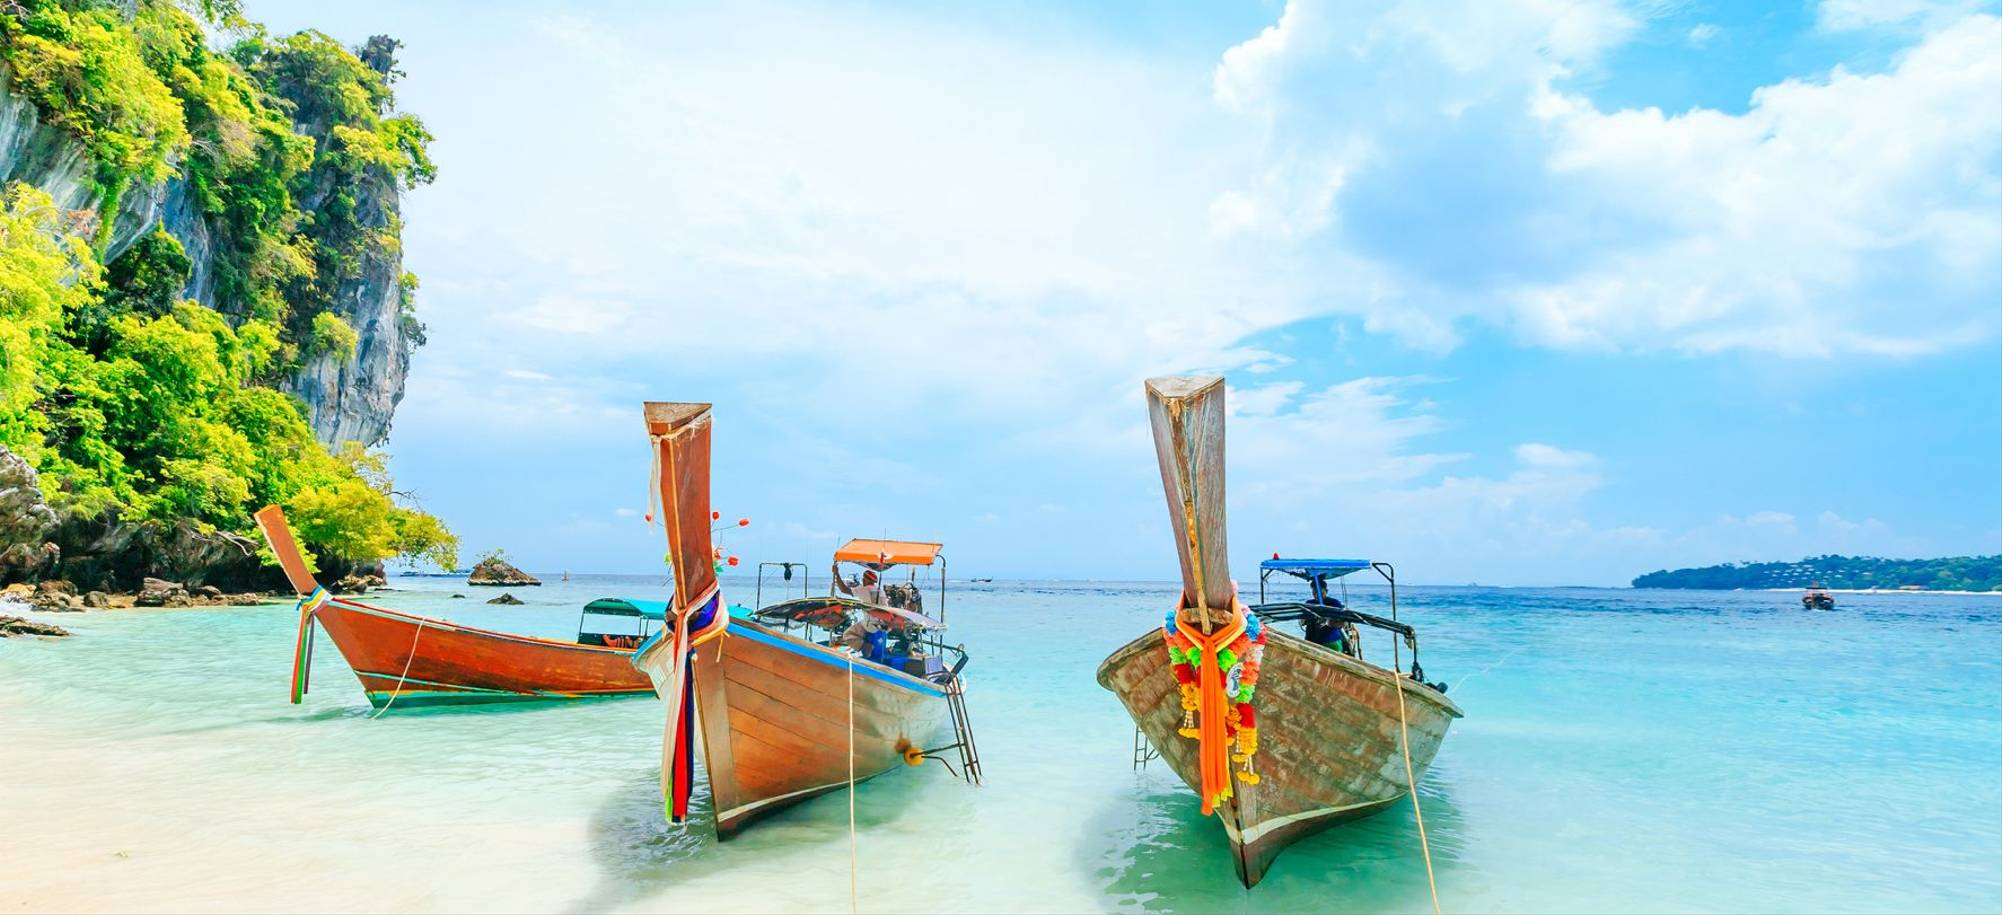 4 Day - Phuket, Thailand - Longtale boat on the whibeach - Itinerary Desktop.jpg